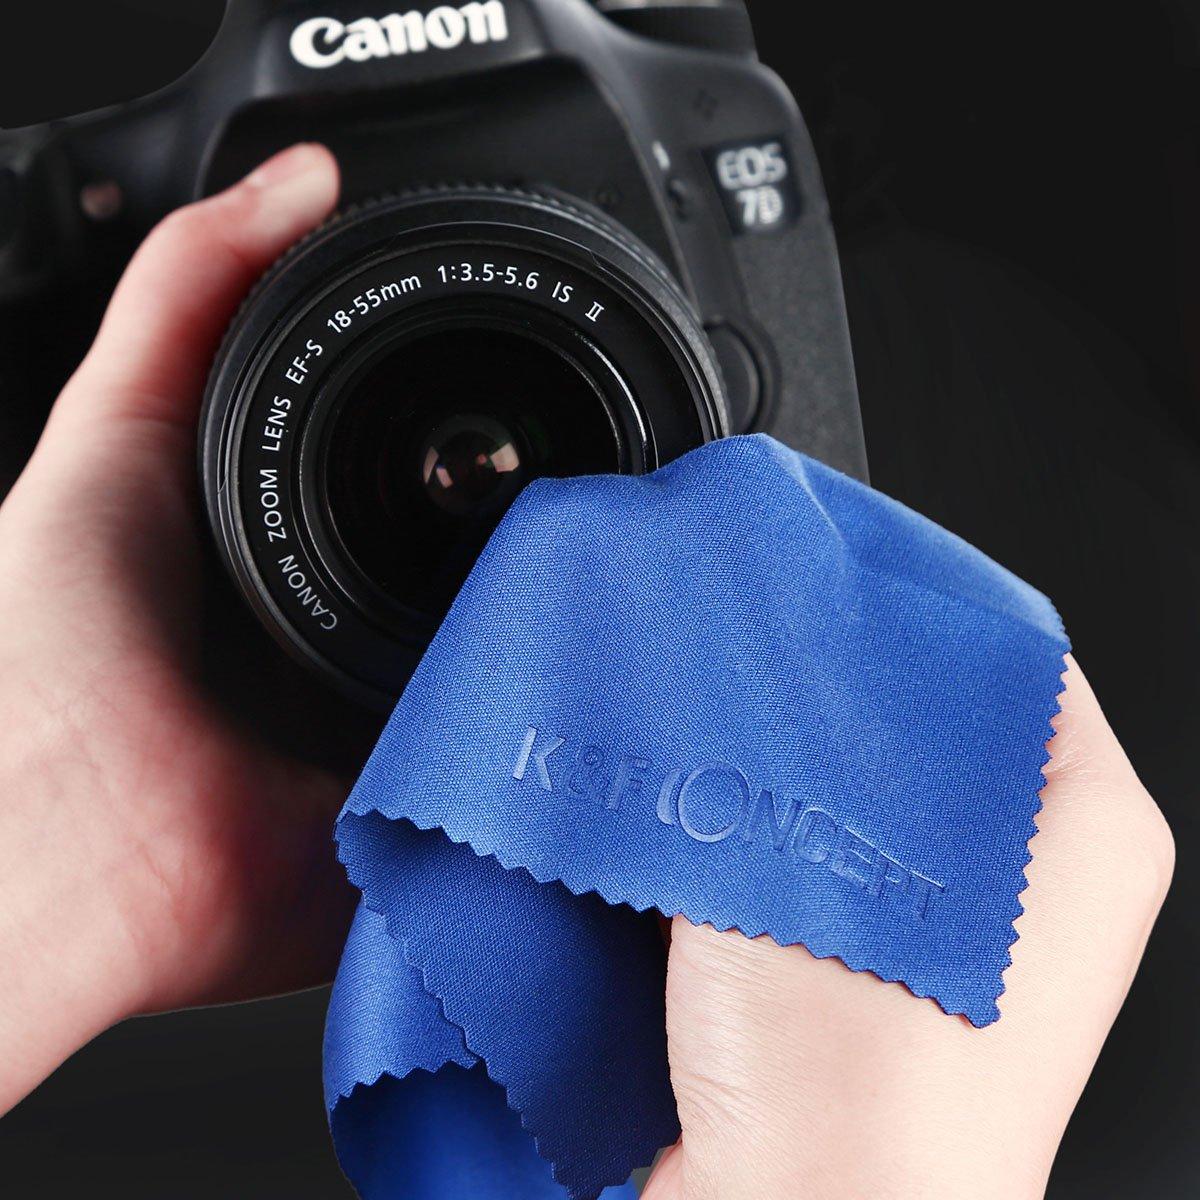 3 Slot Filter Pouch 52MM ND Filter,K/&F Concept 52mm Neutral Density Filter Set ND2 ND4 ND8 Kit ND Filter 52MM ND Filter Kit for Canon Nikon DSLR Cameras Microfiber Lens Cleaning Cloth